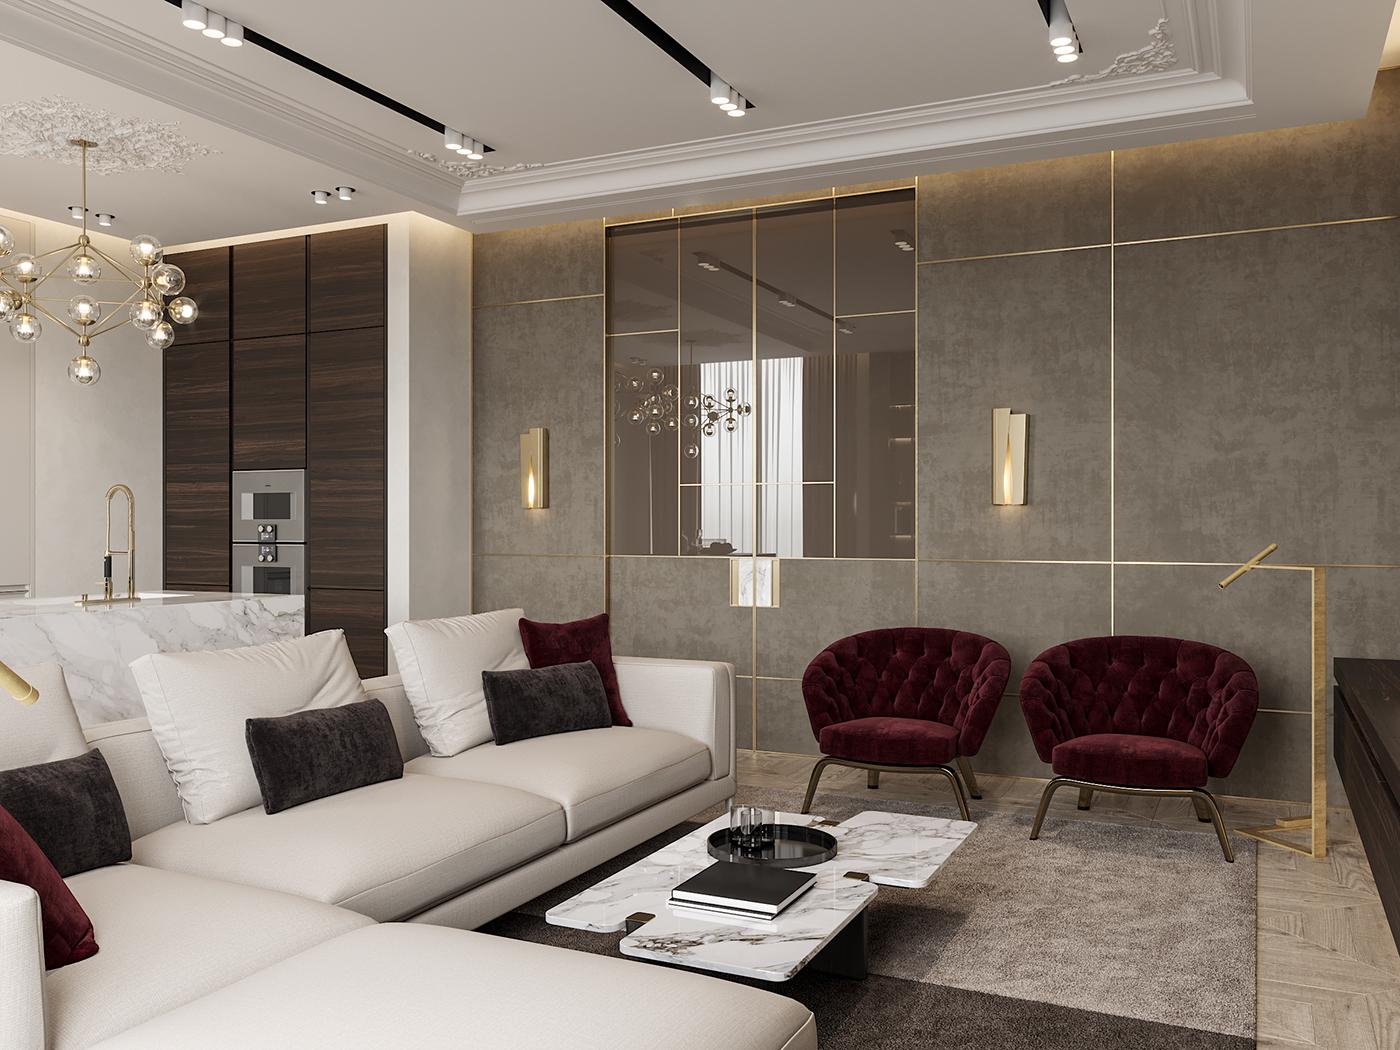 Interior design interiordesign Minimalism modern DE&DE Interior Studio designer corona render  3ds max photoshop